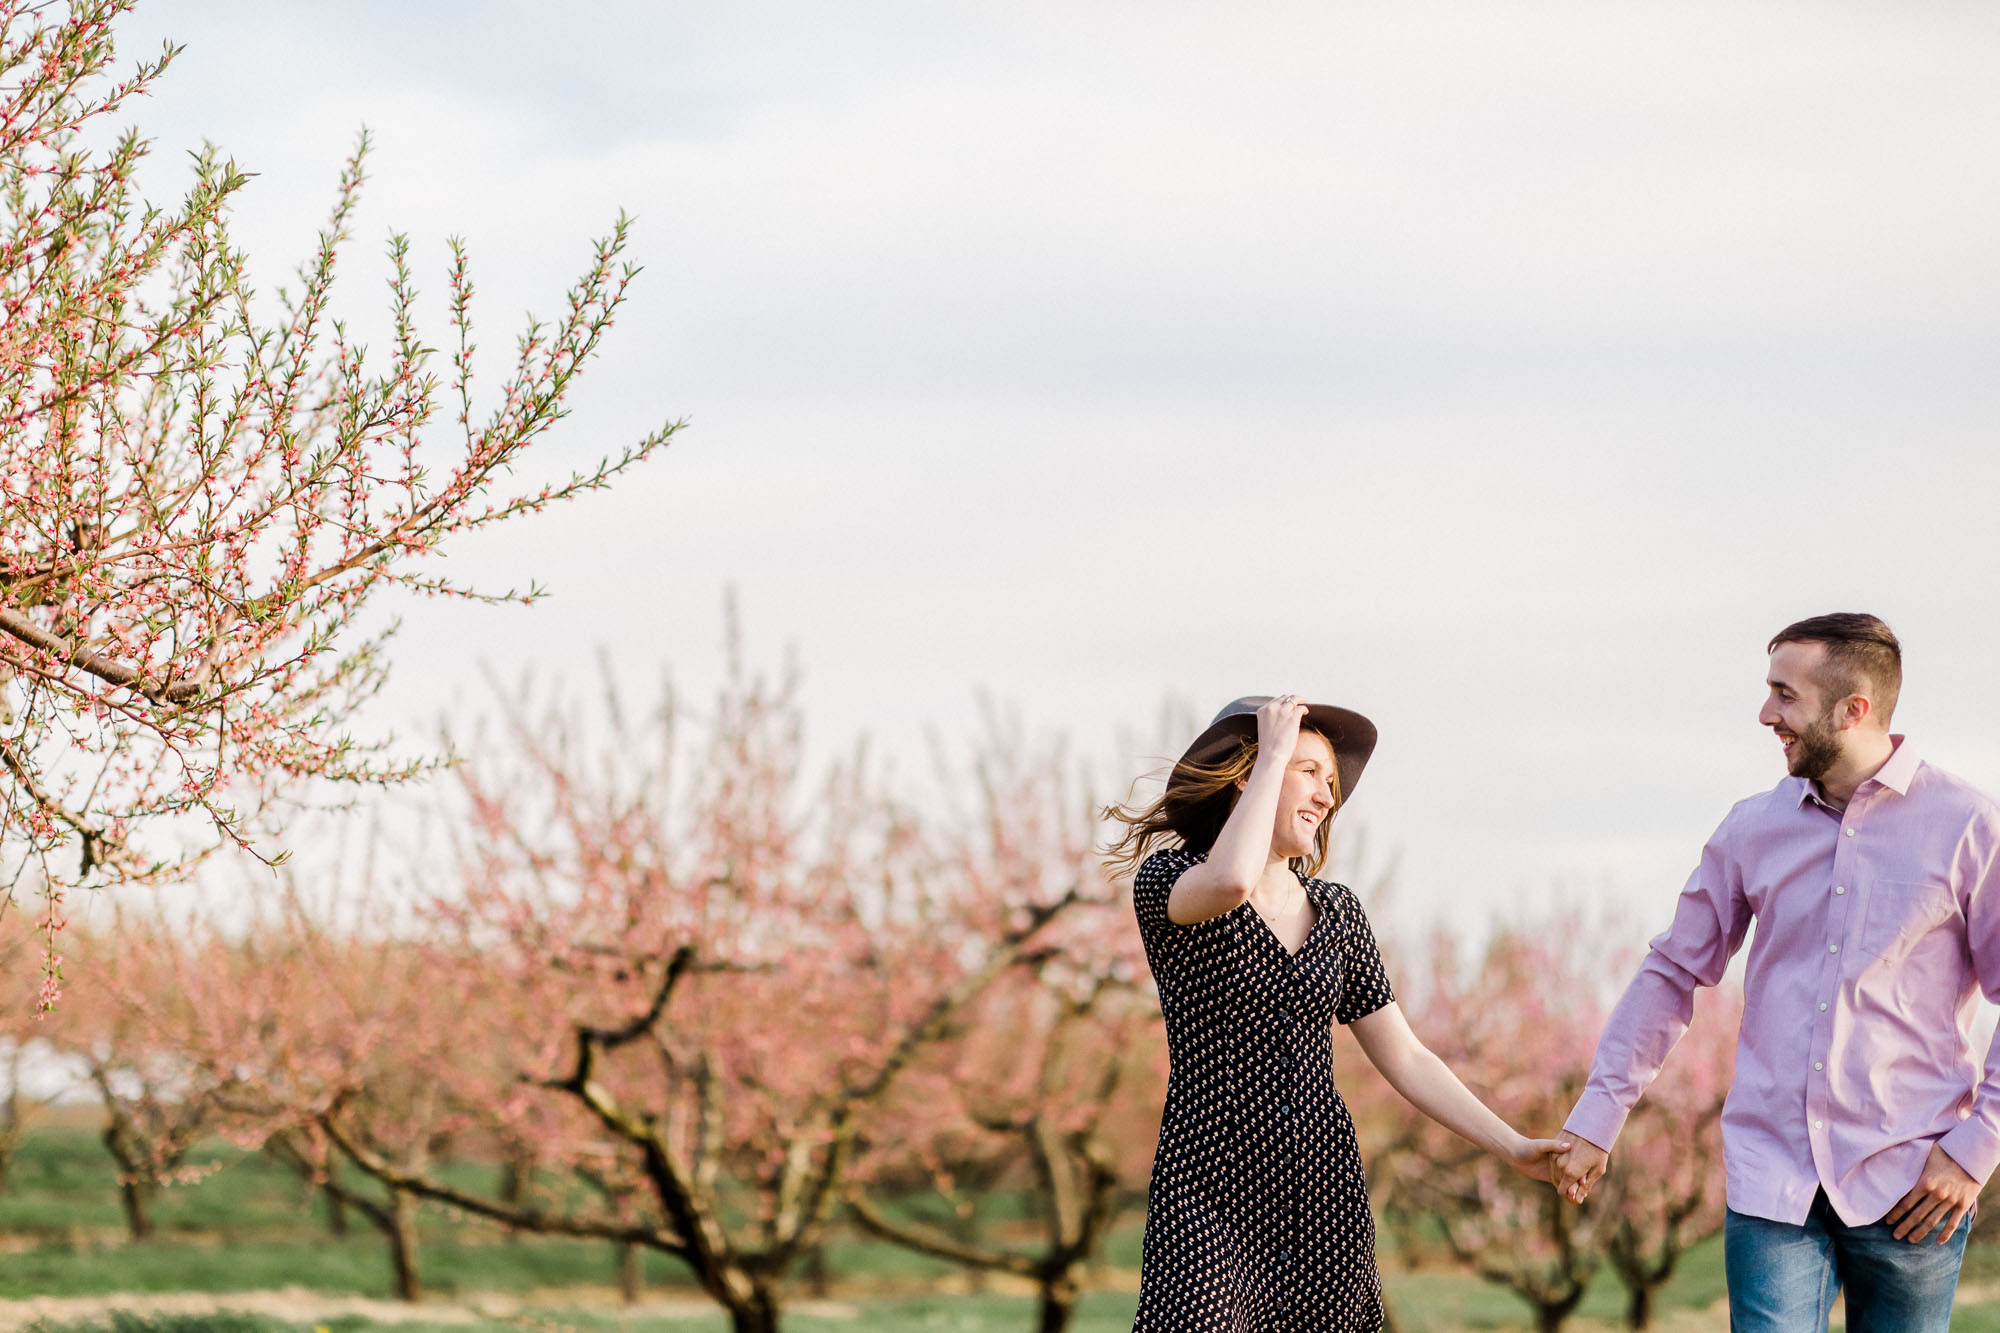 Rohrbachs-Spring-cherry-blossom-engagement-7432.jpg